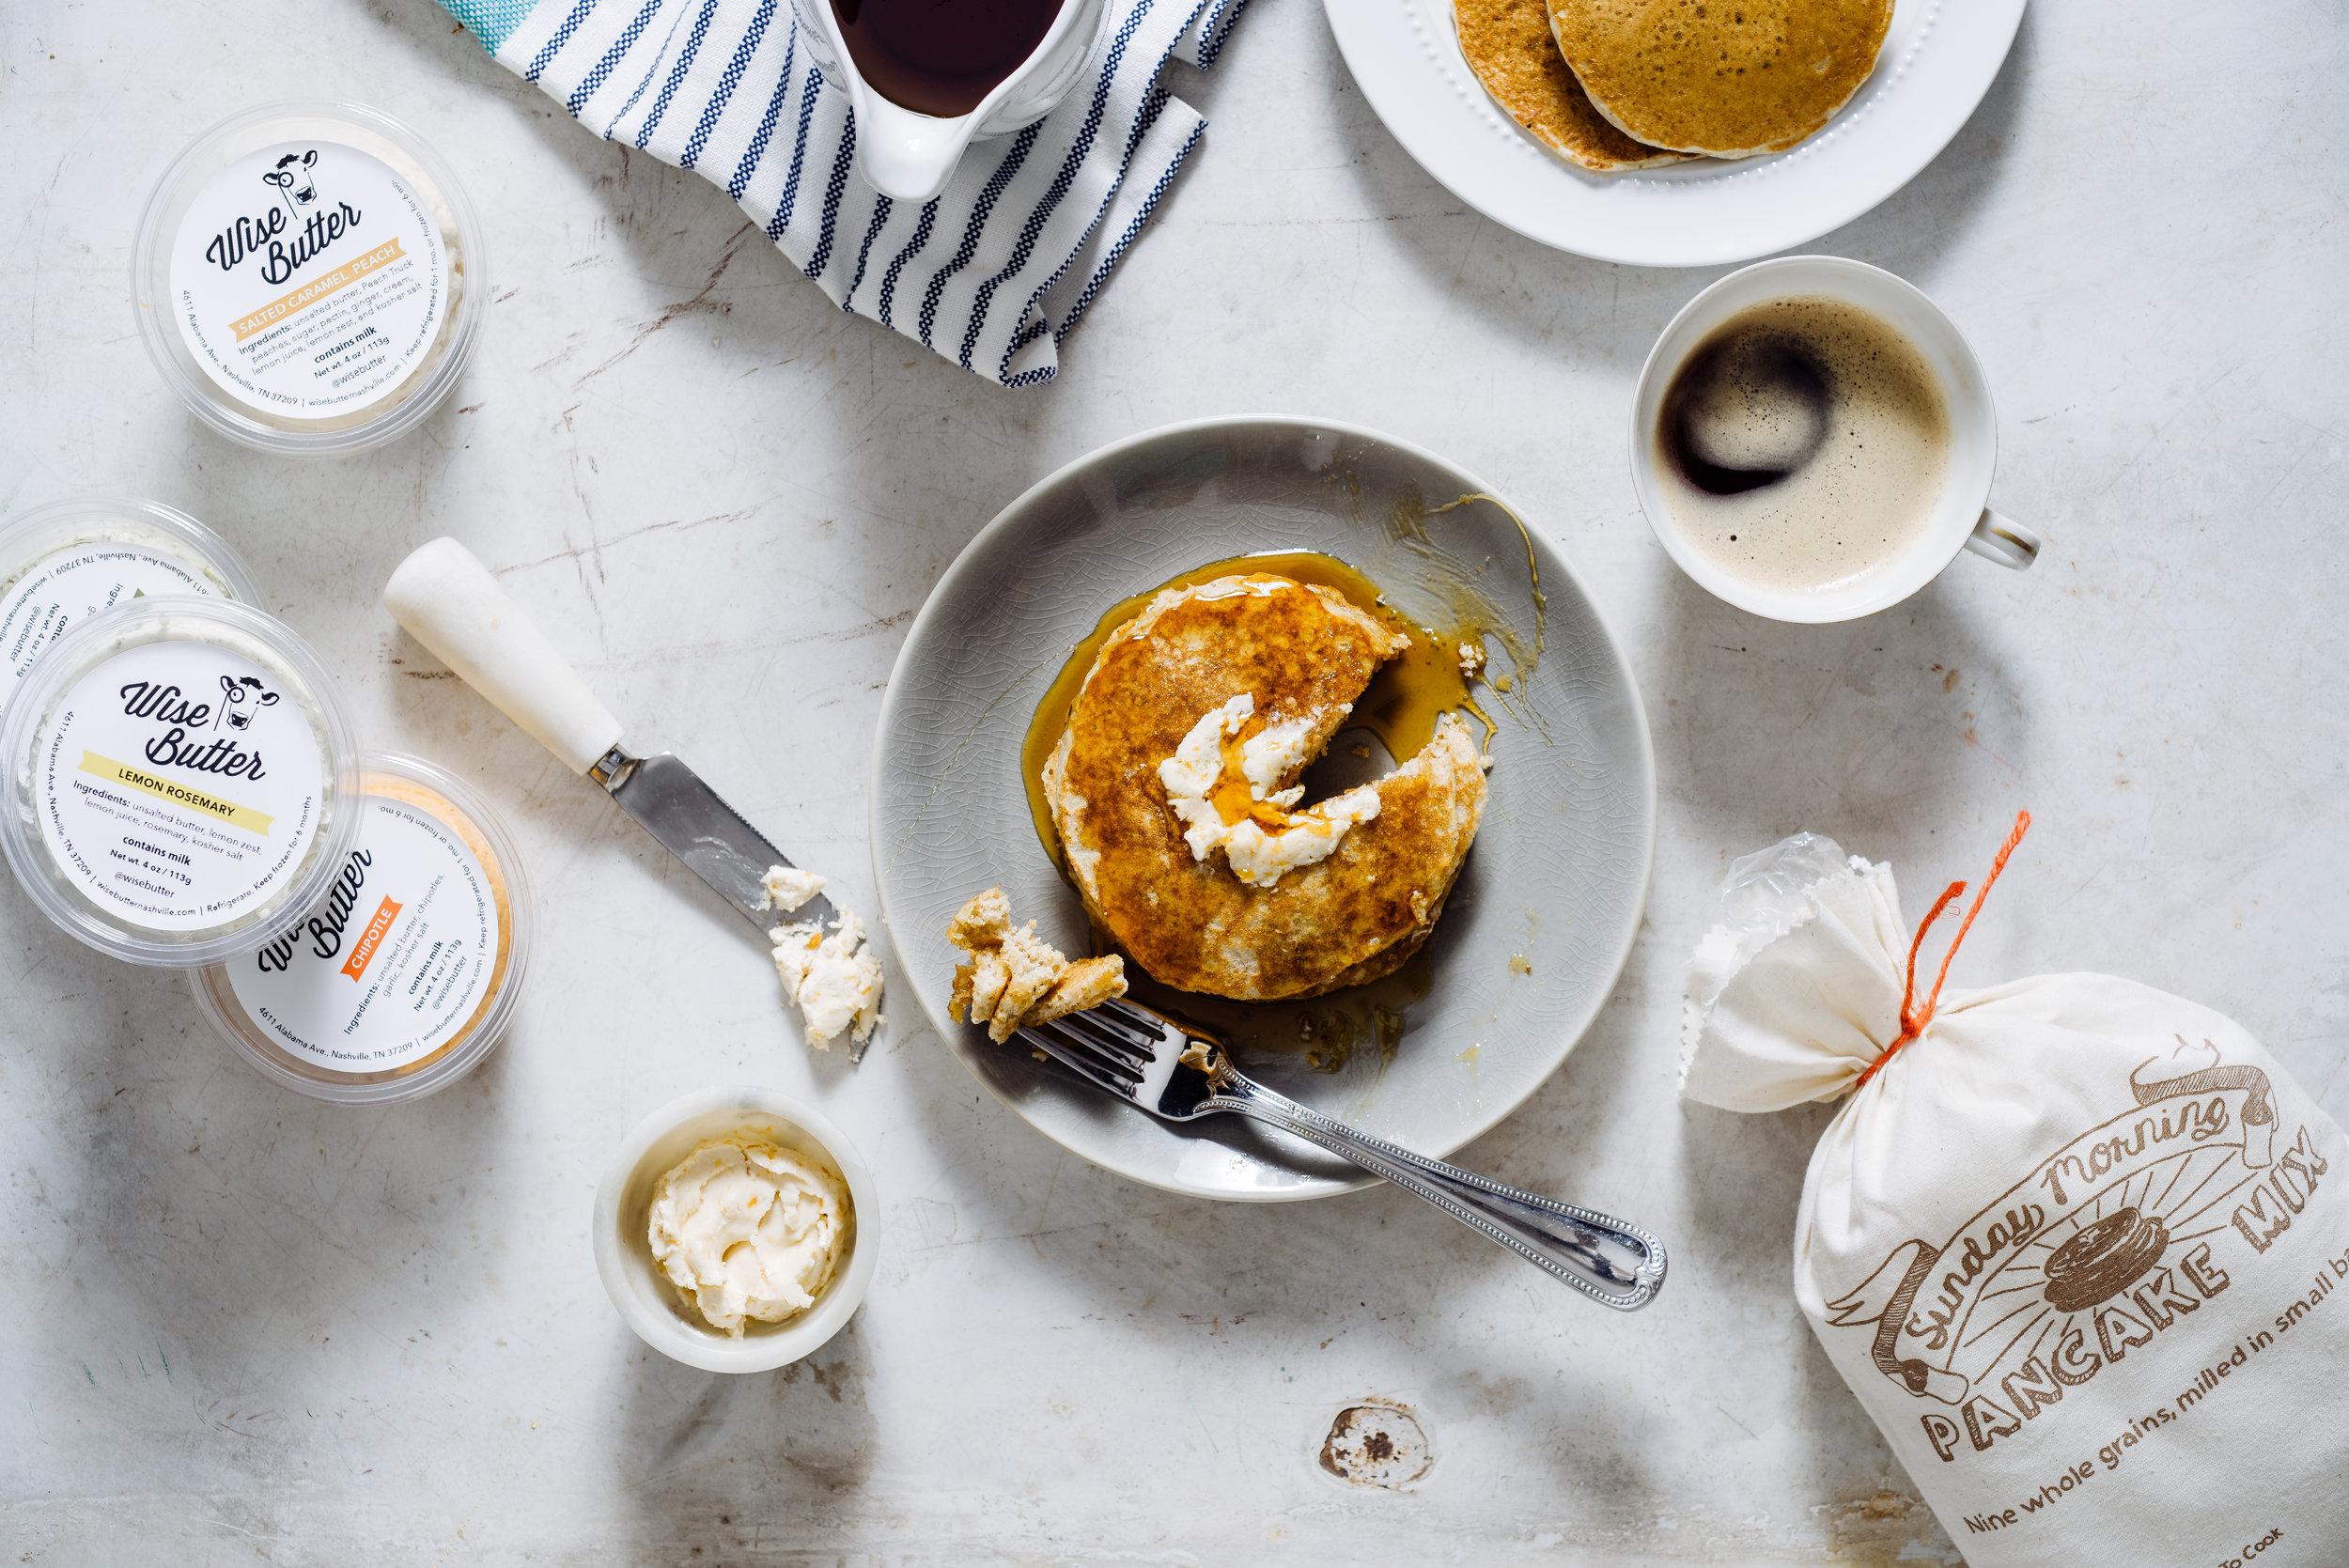 Sunday-Morning-Pancakes-Wise-Butter-6.jpg